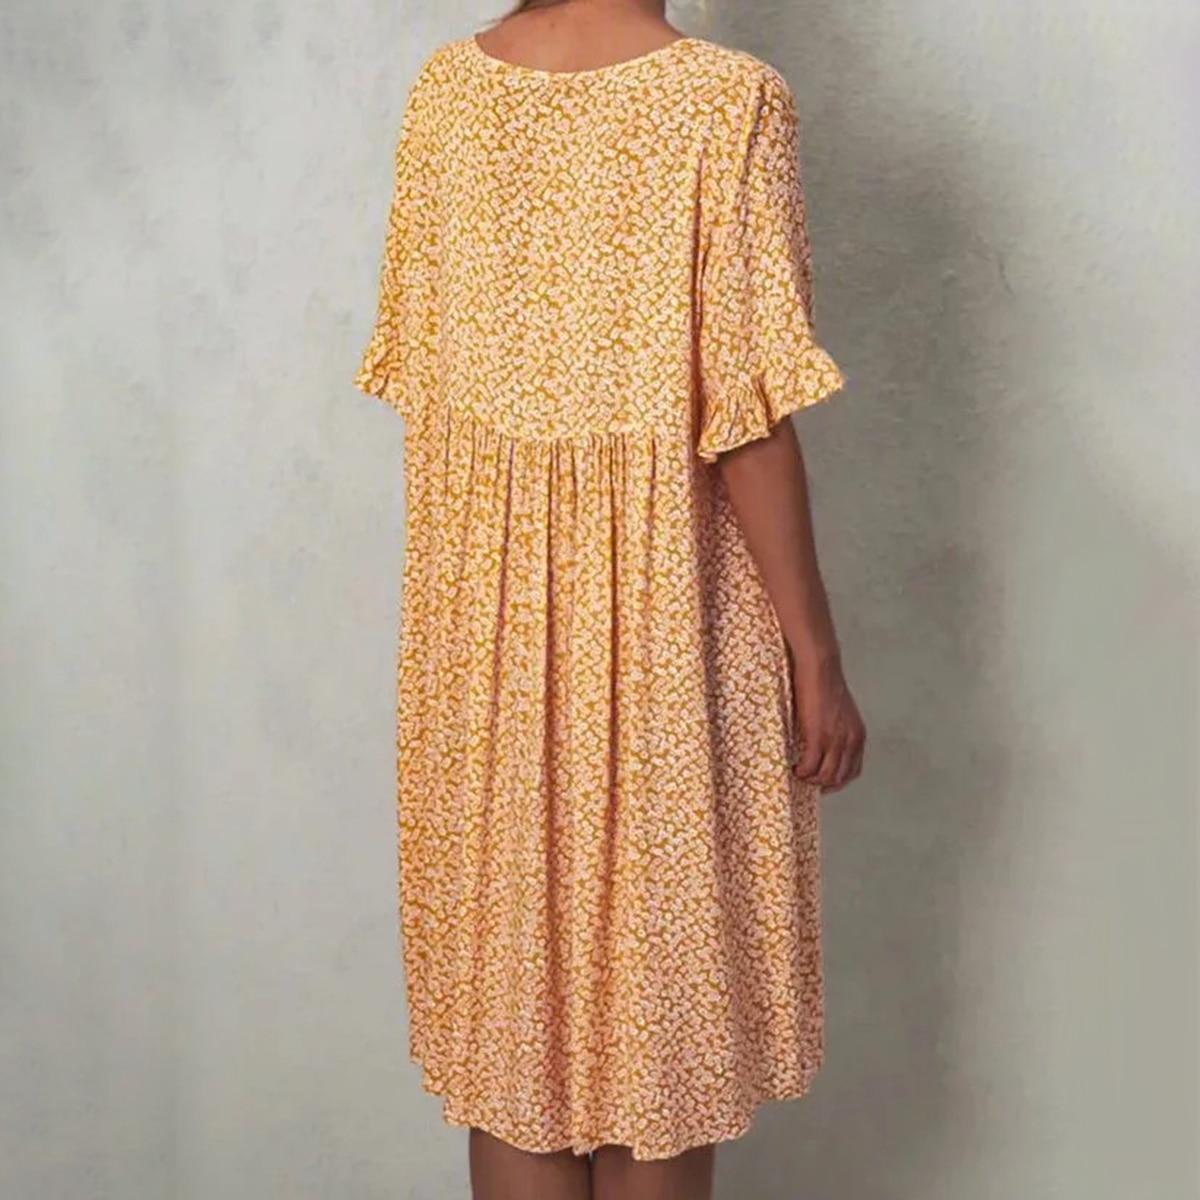 Floral Print Midi Dress Women Round Collar Ruffles Short Sleeve Knee Length Dress Summer Autumn 2020 Casual Chic Vestidos Female